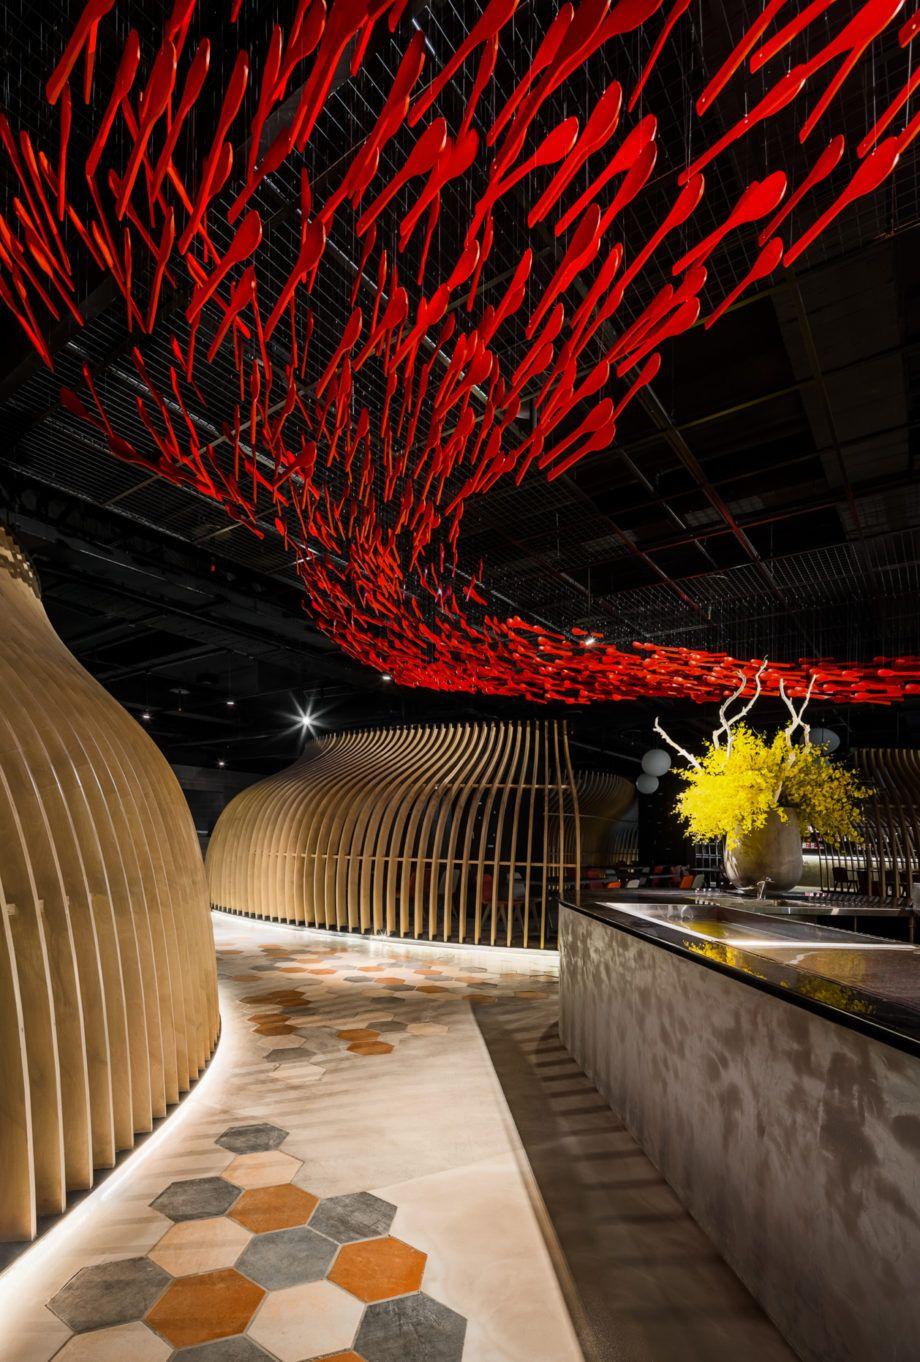 Honouring The World S Best Interiors Submit Your Best Work Bar Design Awards Bar Design Restaurant Architecture